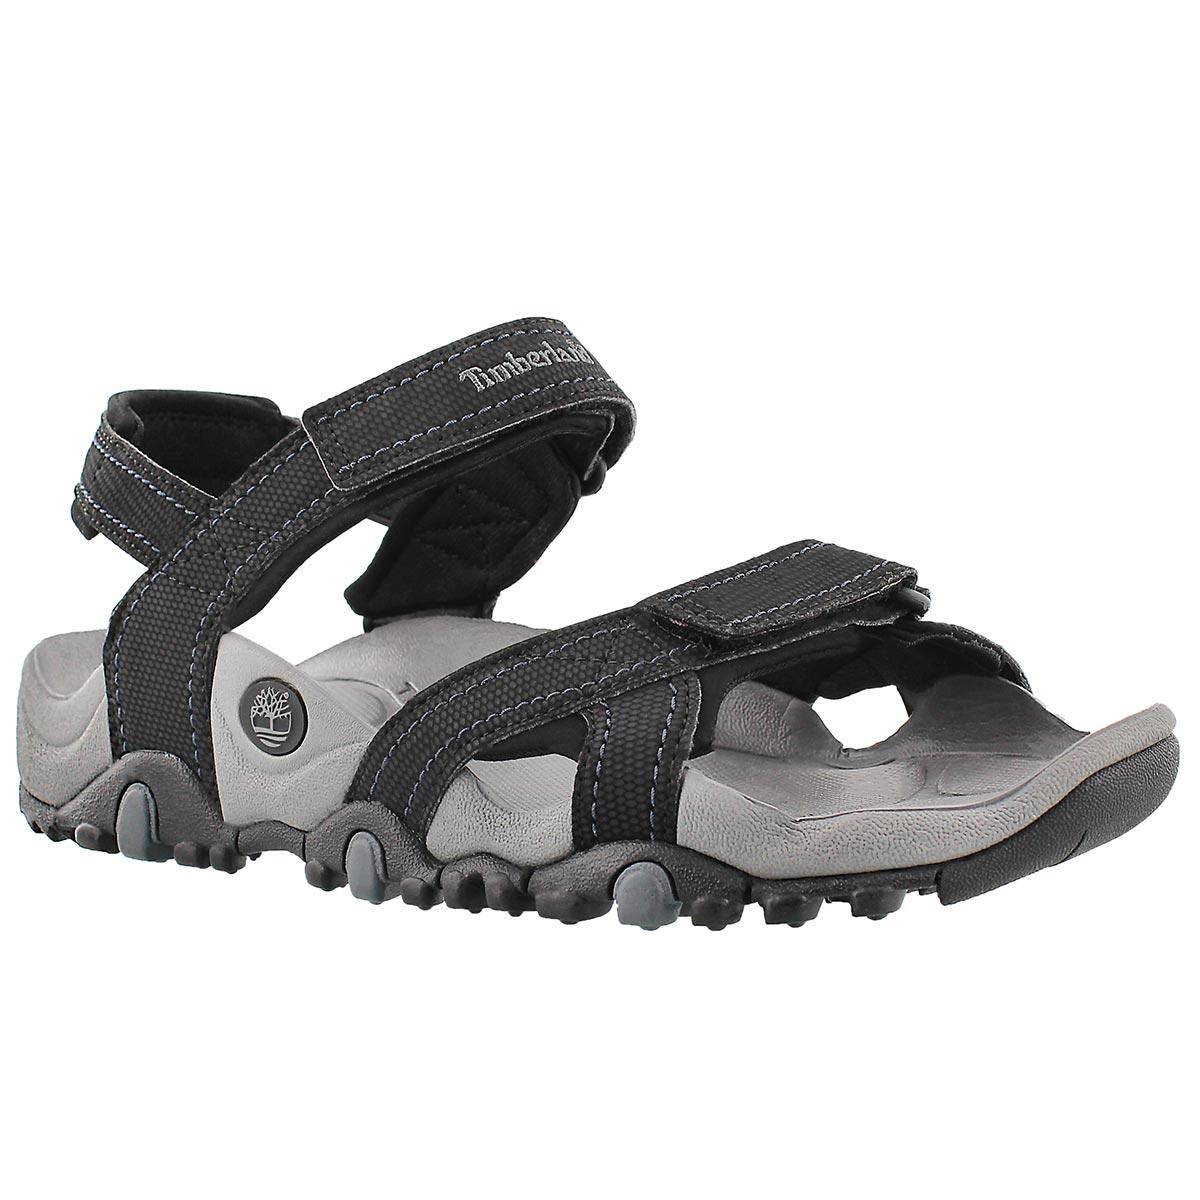 Timberland-Men-039-s-New-Granite-Trailray-Water-Friendly-Sport-Sandal